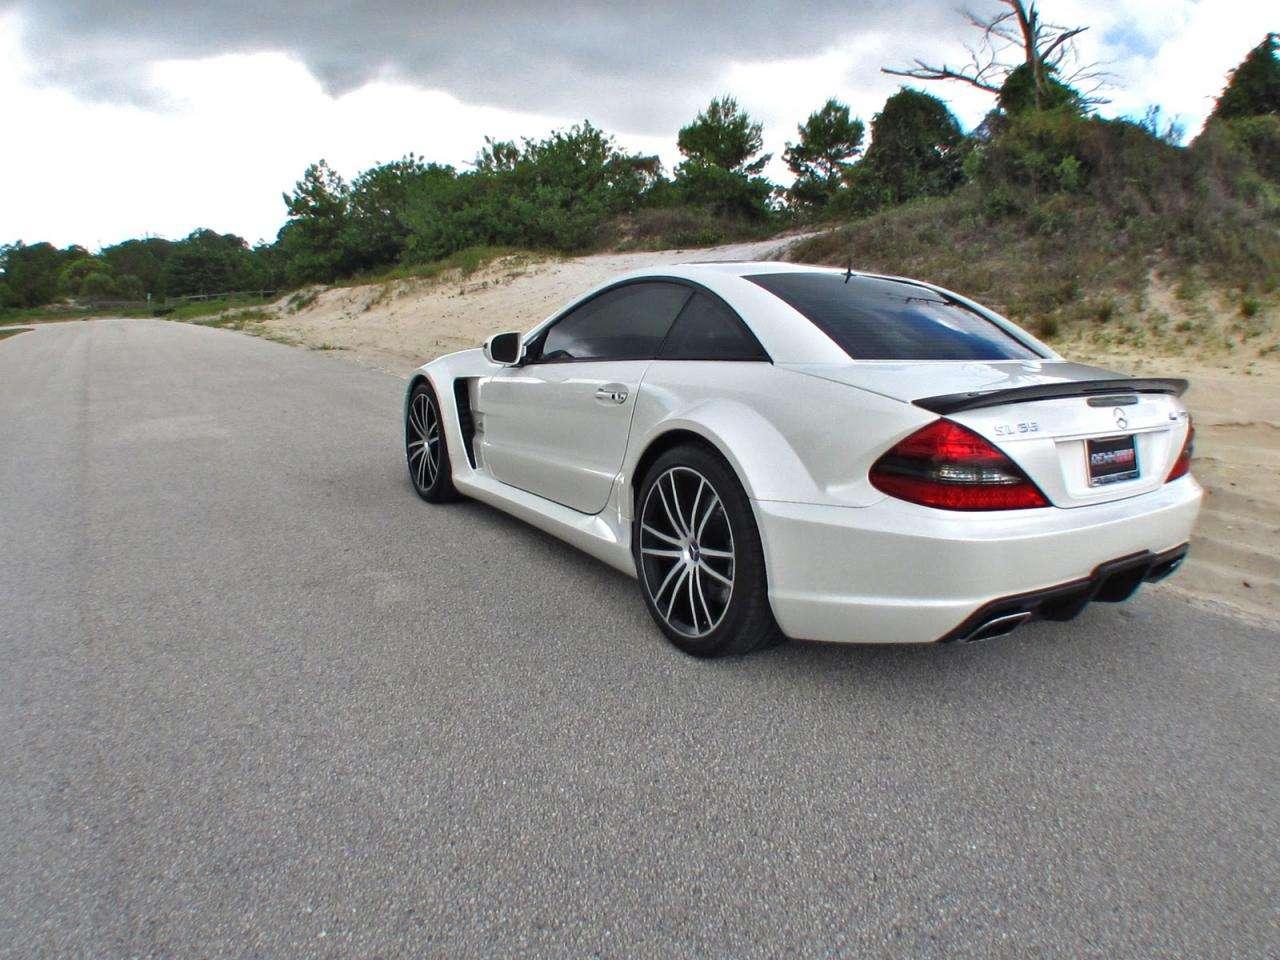 Mercedes SL65 AMG Black Series od Renntech lipiec 2010